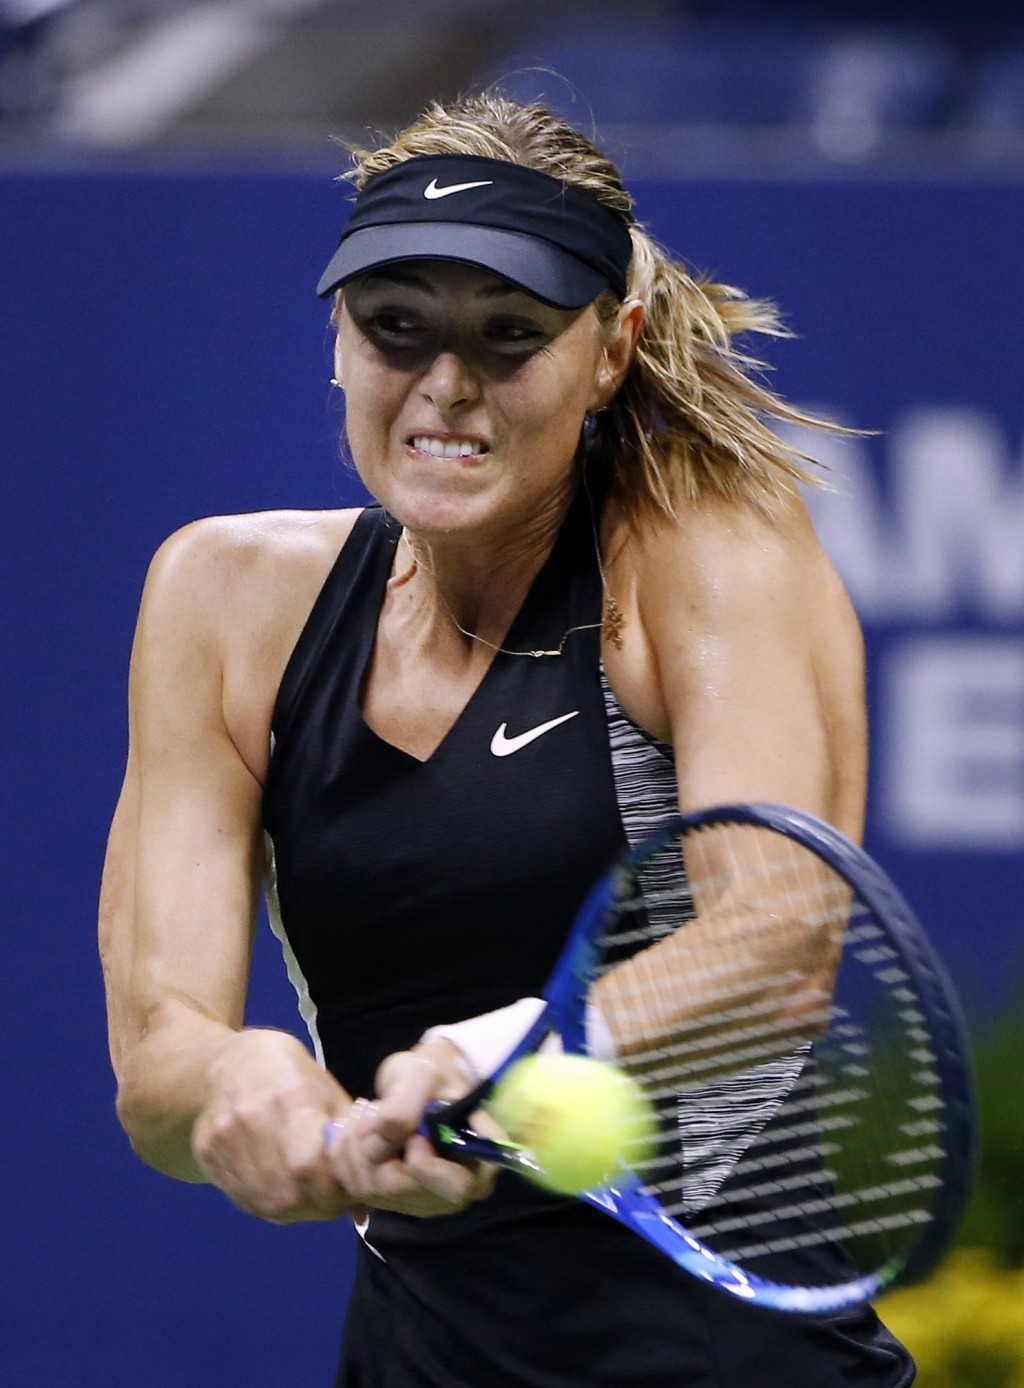 Maria Sharapova, of Russia, returns a shot to Carla Suarez Navarro, of Spain, during the fourth round of the U.S. Open tennis tournament, Monday, Sept...